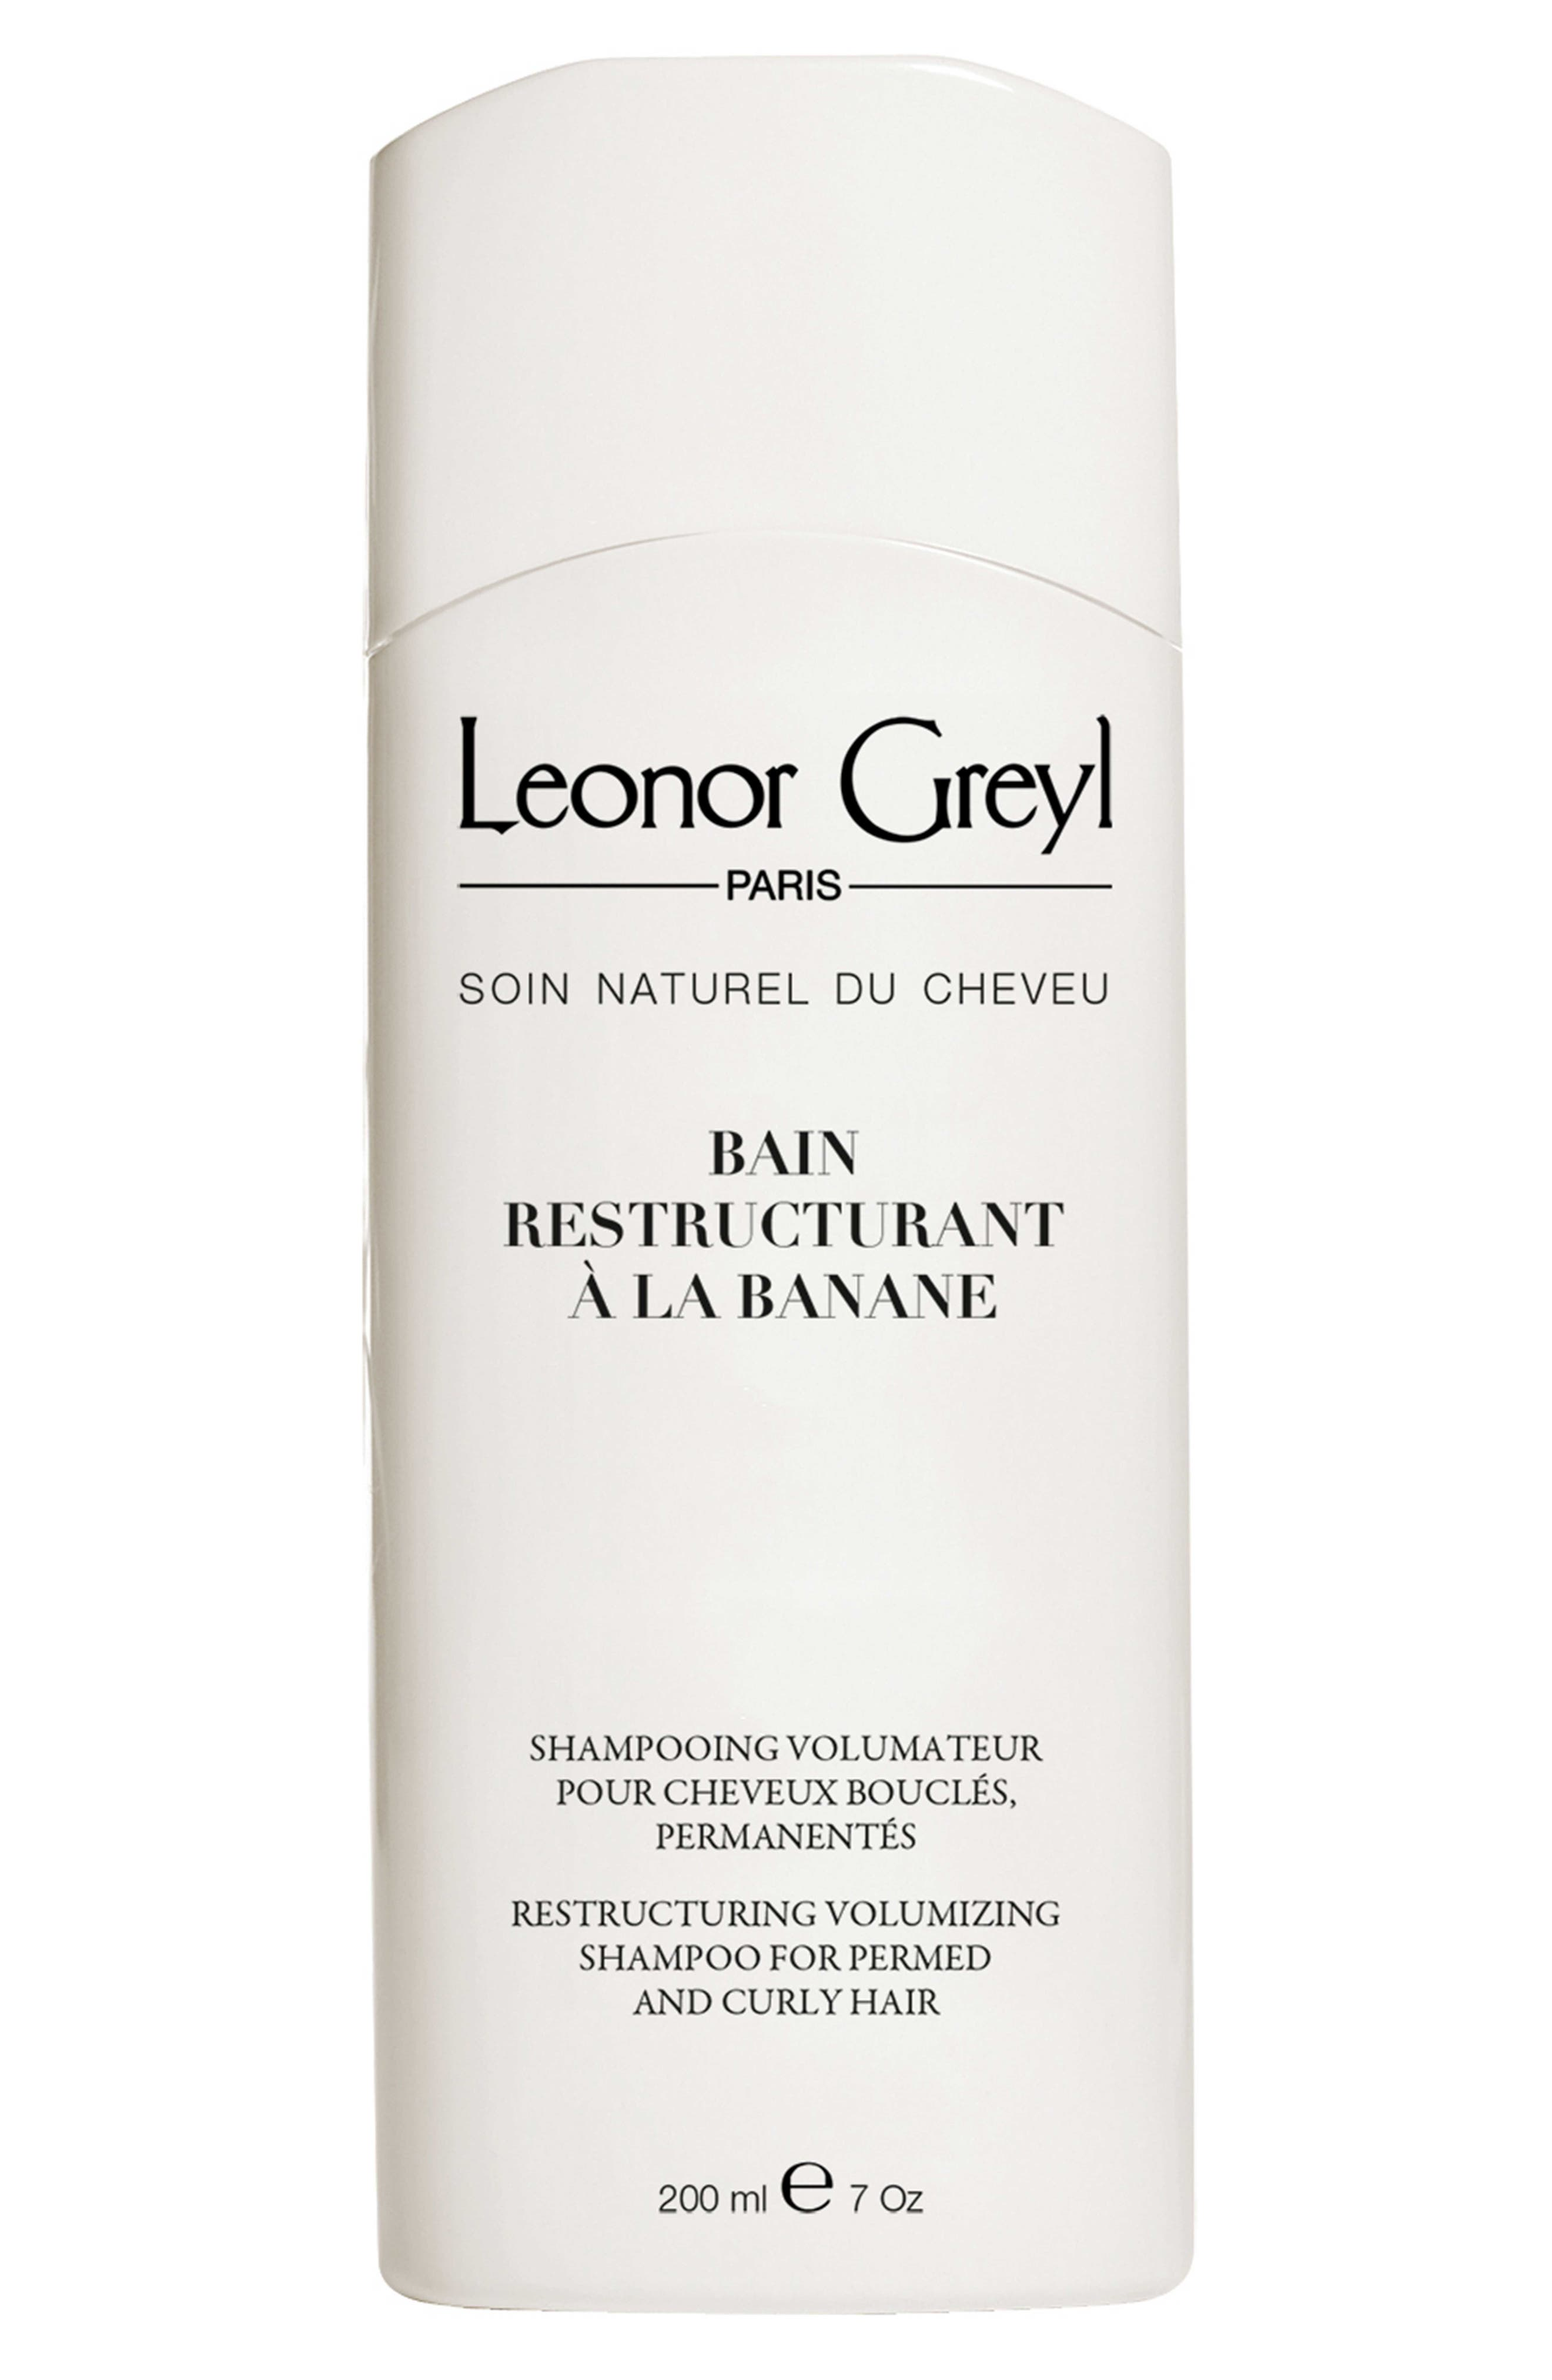 Main Image - Leonor Greyl PARIS 'À la Banane' Restructuring Shampoo